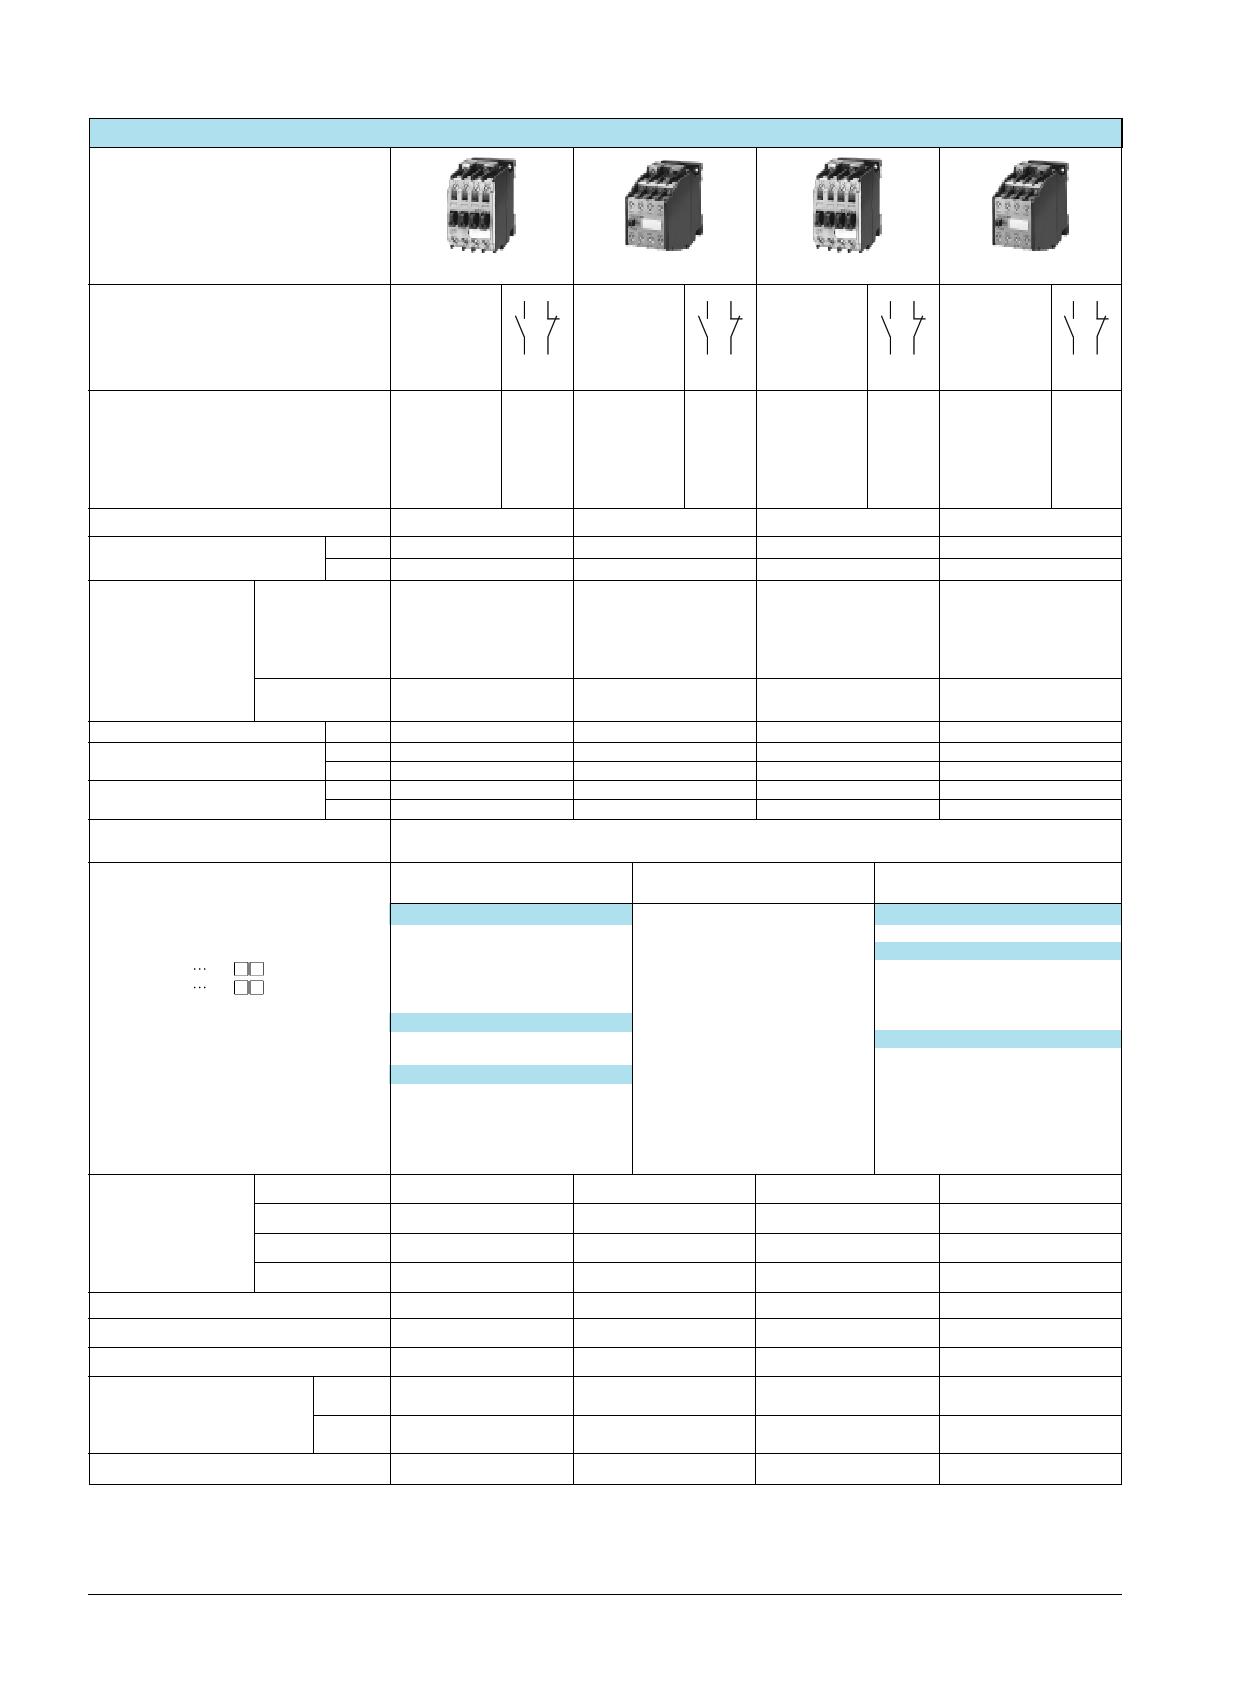 3TF47 Datasheet, 3TF47 PDF,ピン配置, 機能